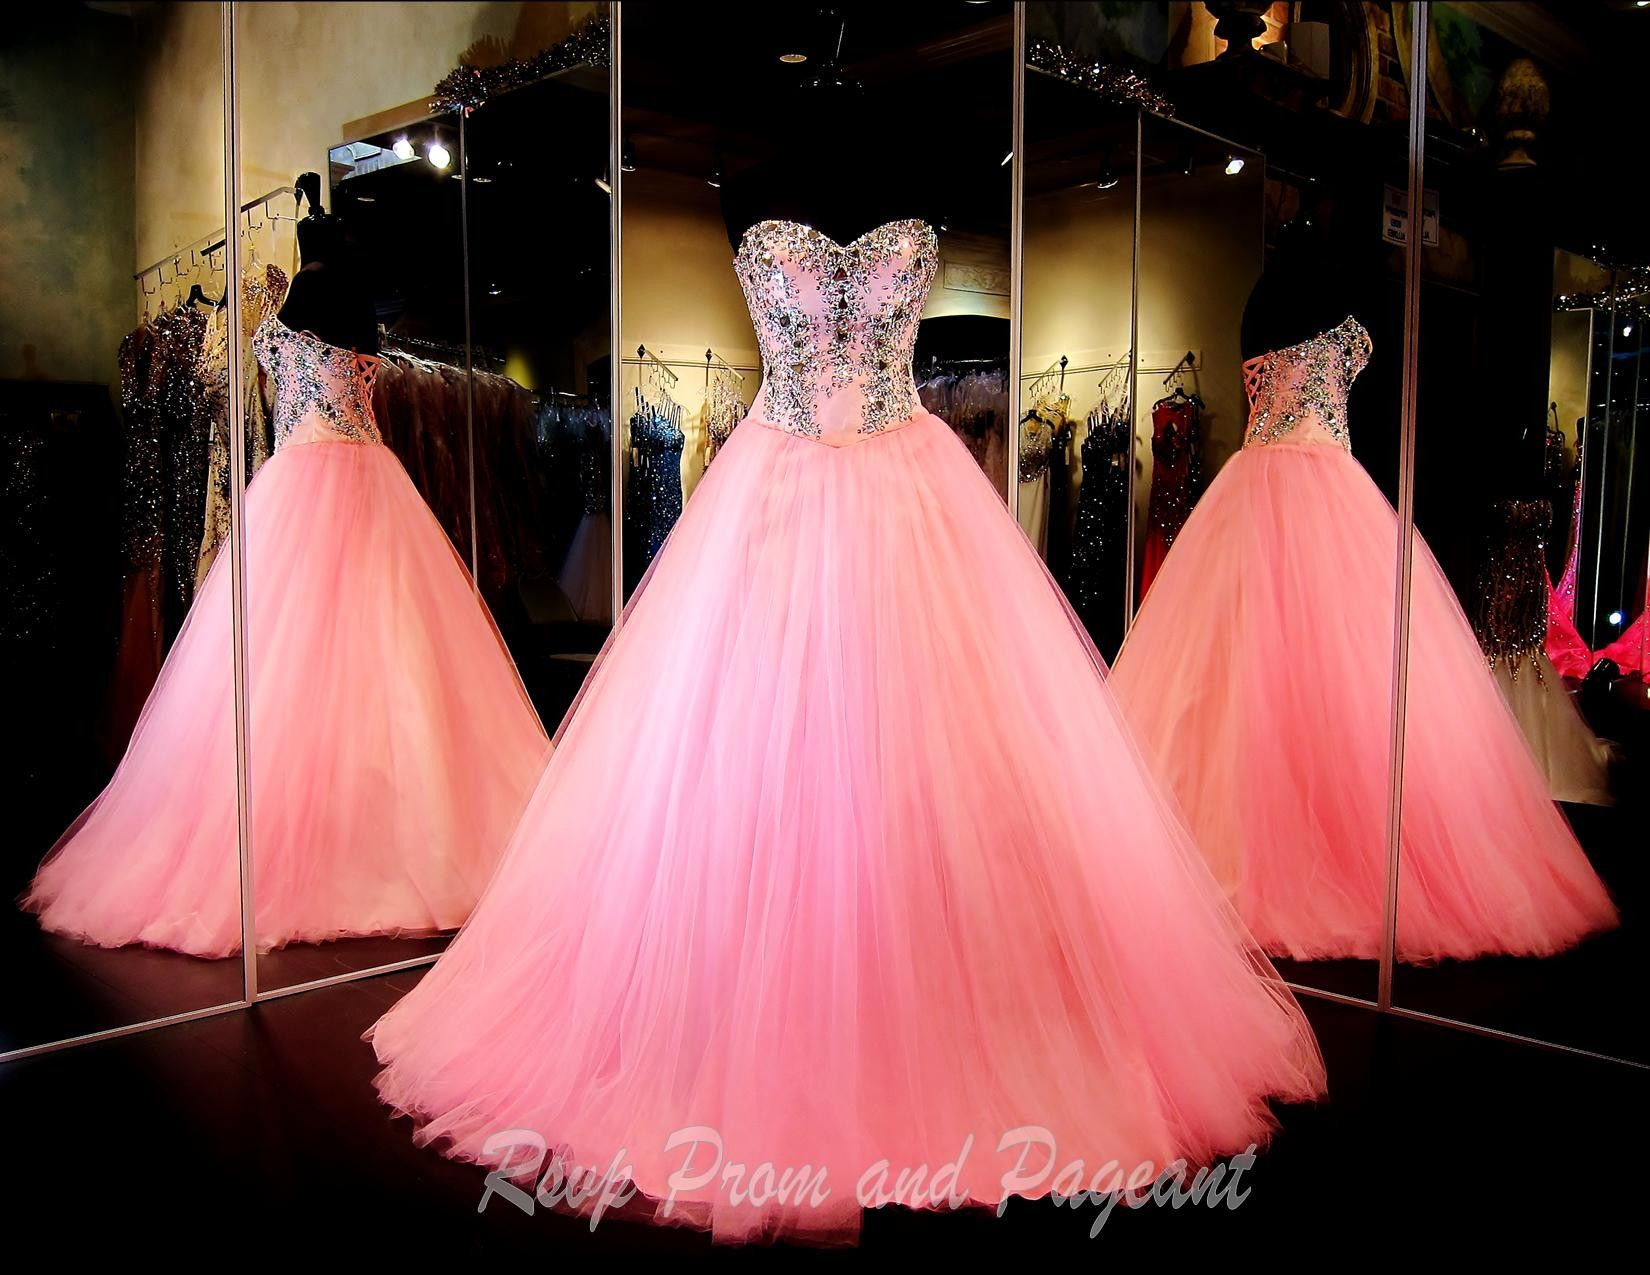 Pink sweetheart neckline ball gown prom dress pinterest rsvp